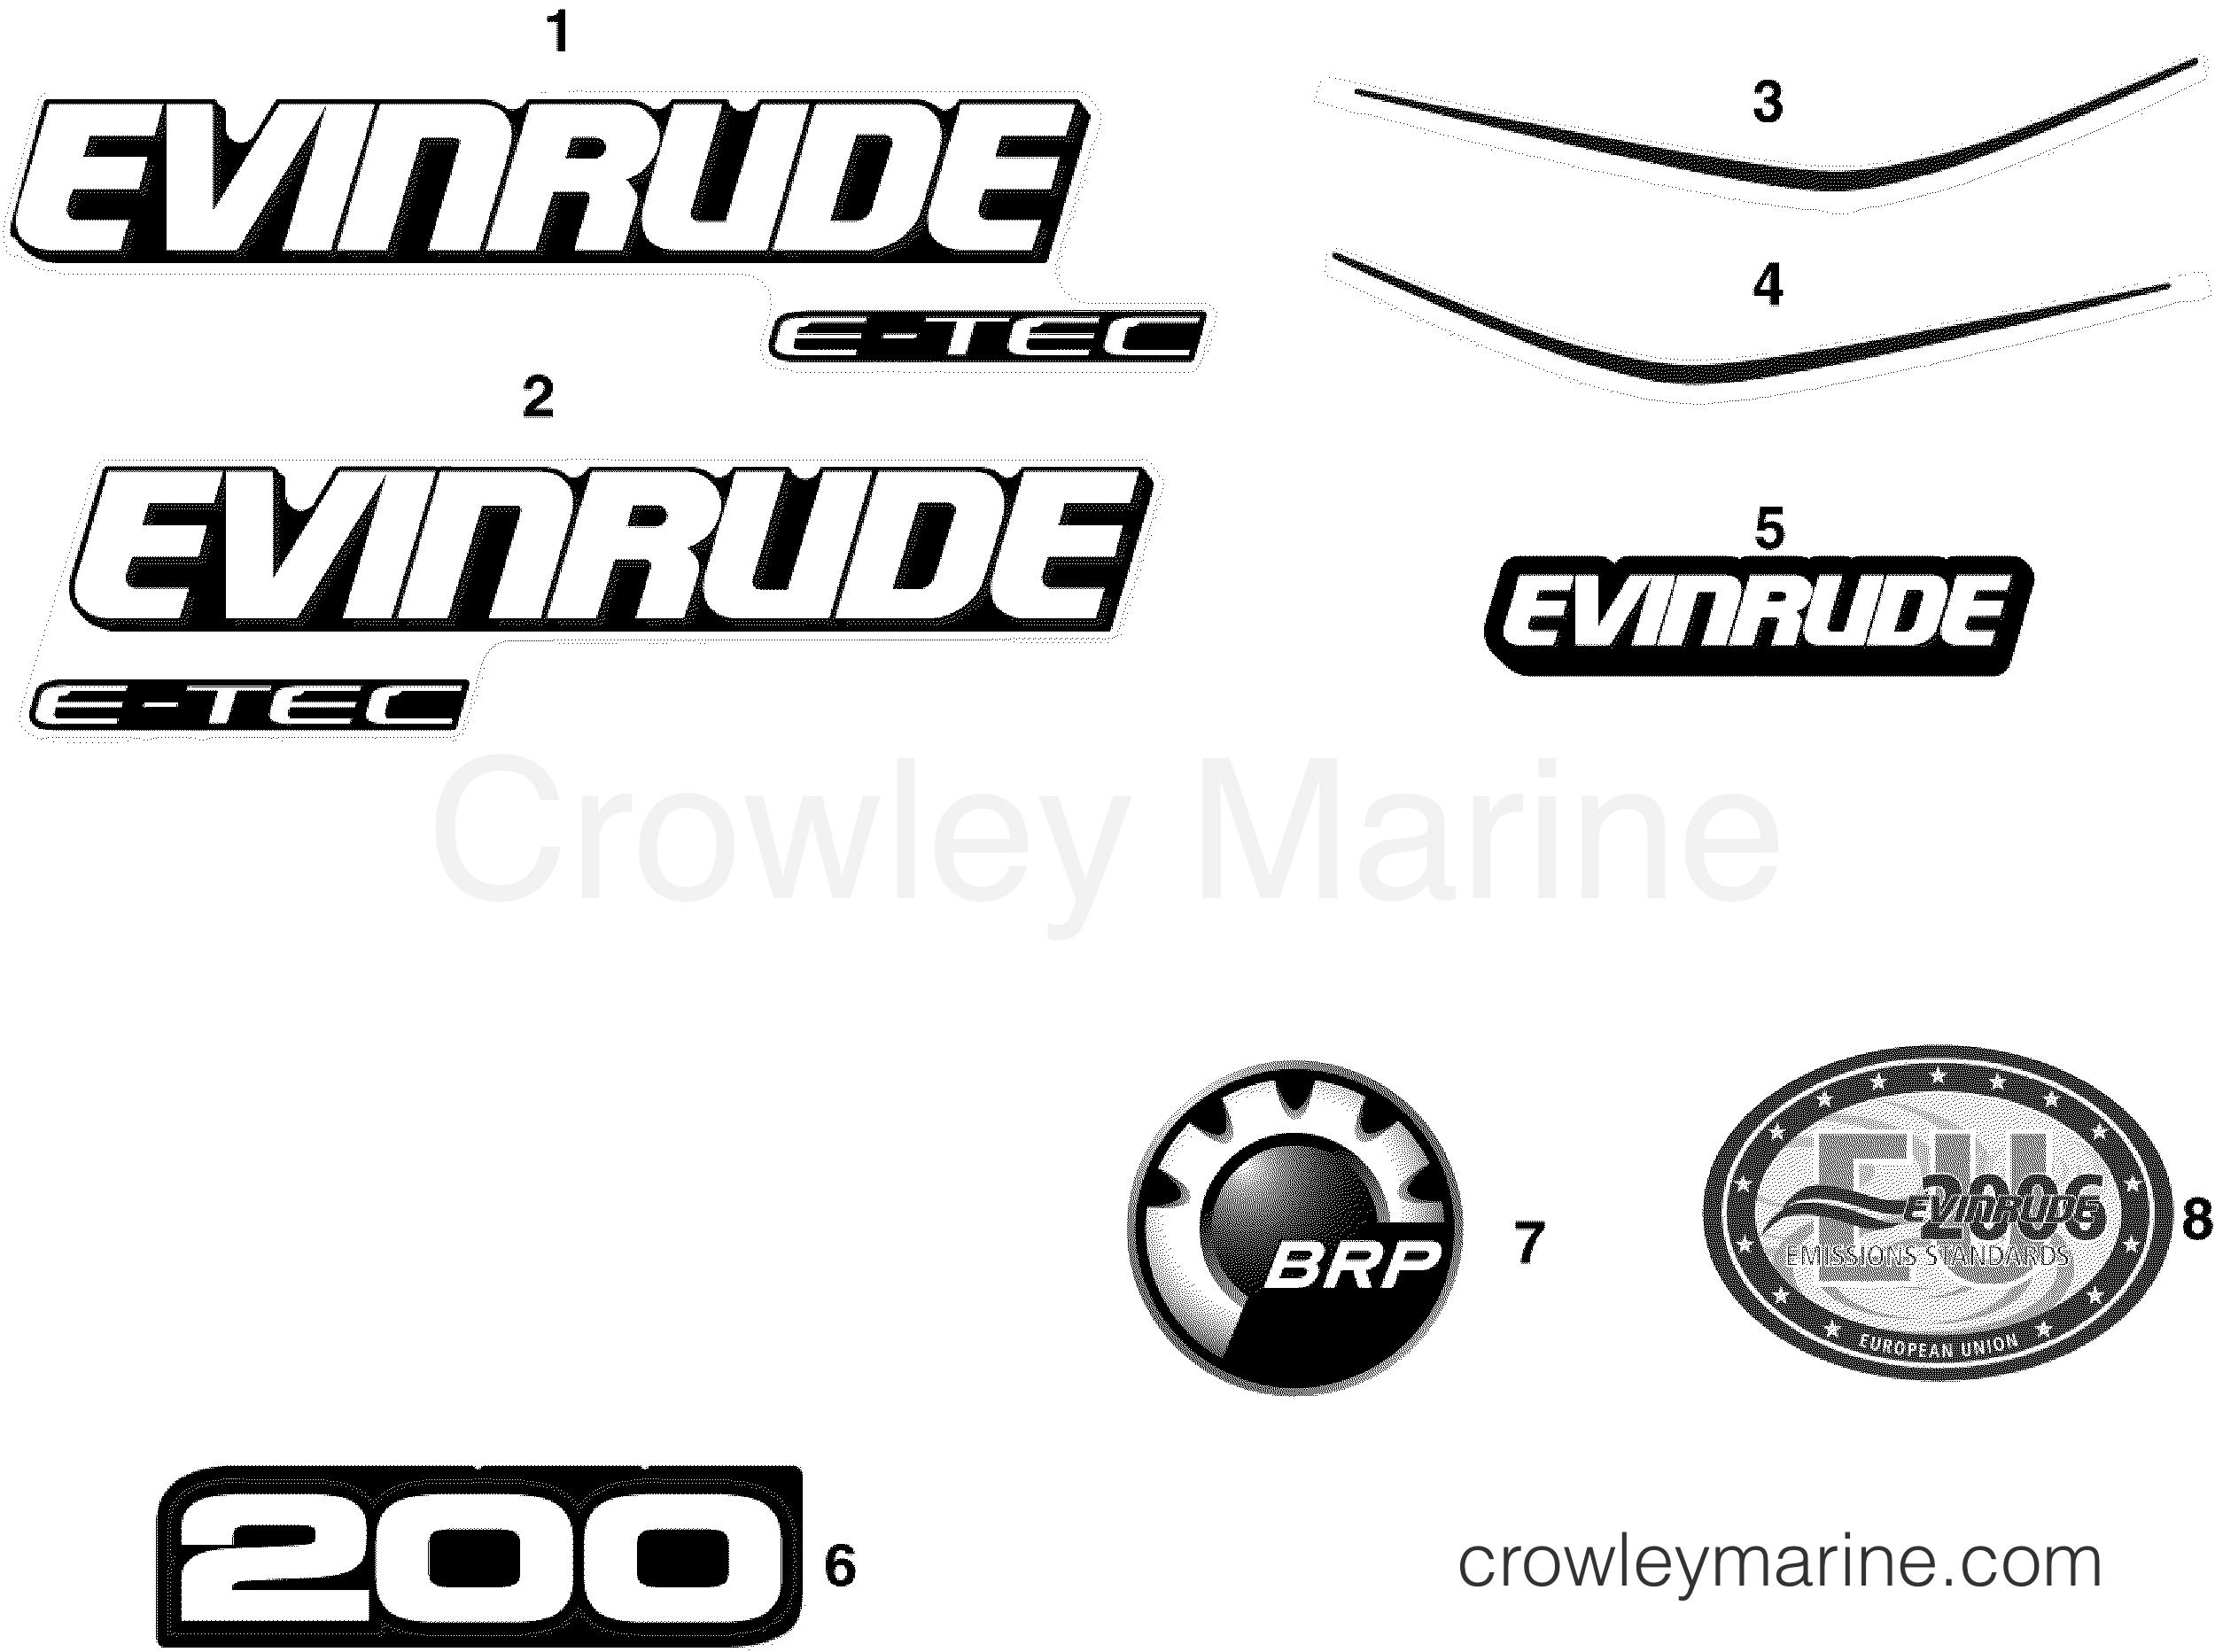 Decals 2007 Evinrude Outboards 200 E200dplsuf Crowley Marine